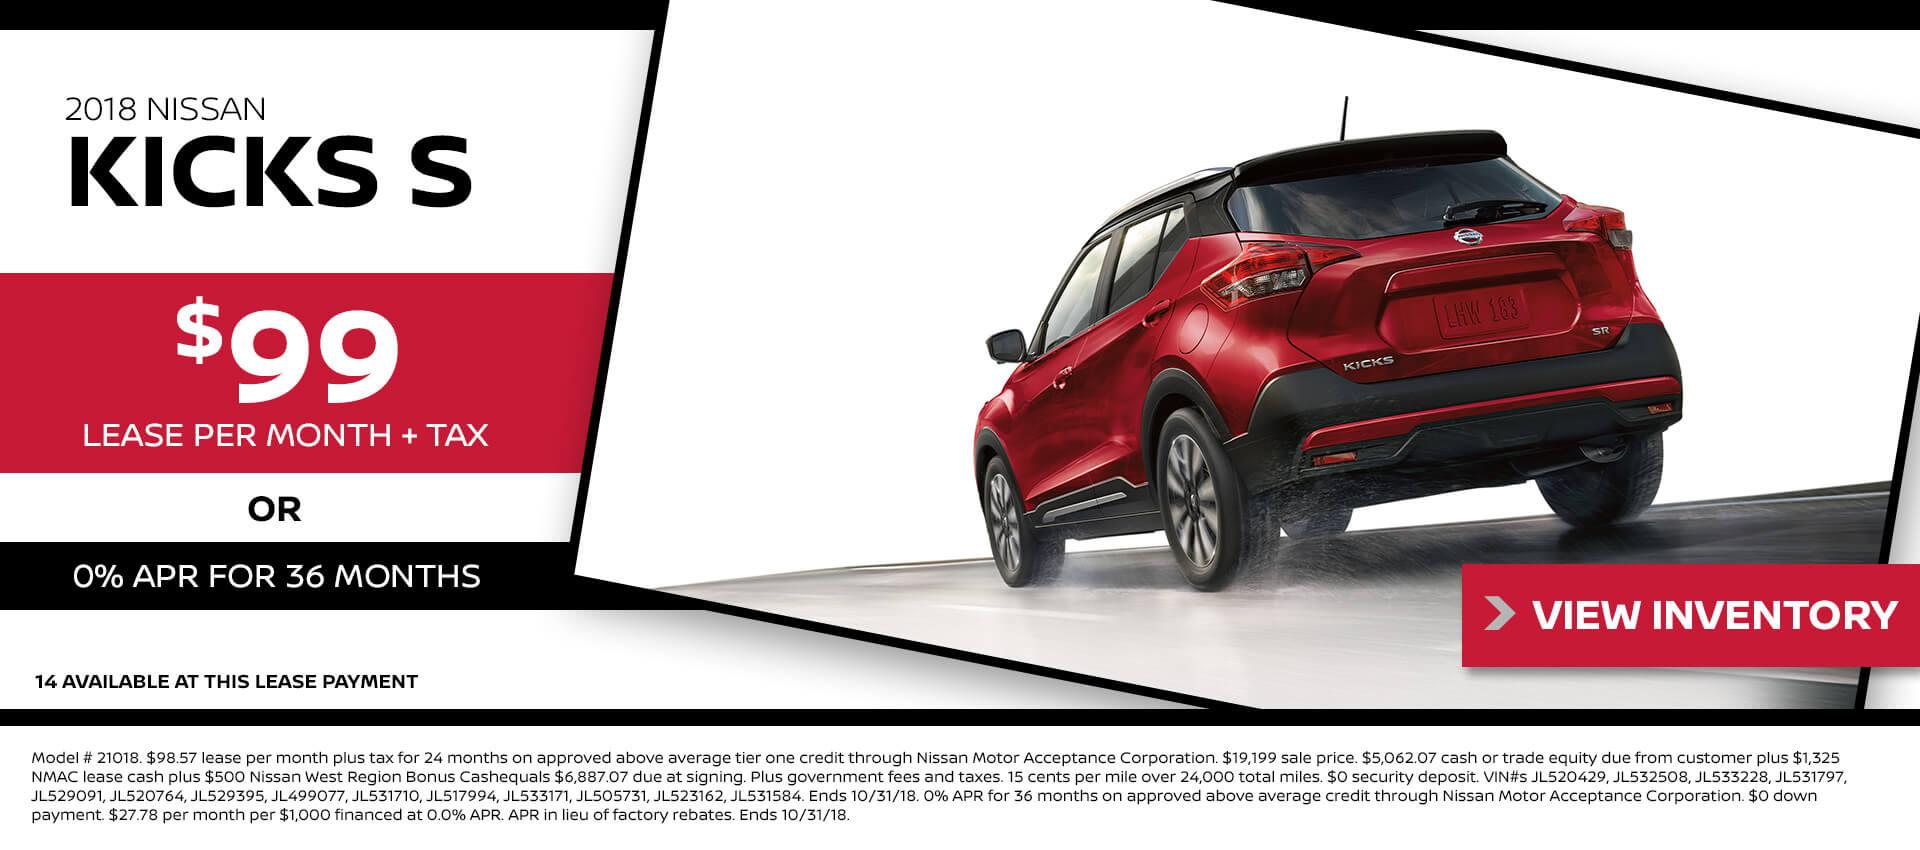 Great New 2017 2018 Nissan U0026 Used Car Dealer In San Diego, CA | Mossy Nissan 7  Locations